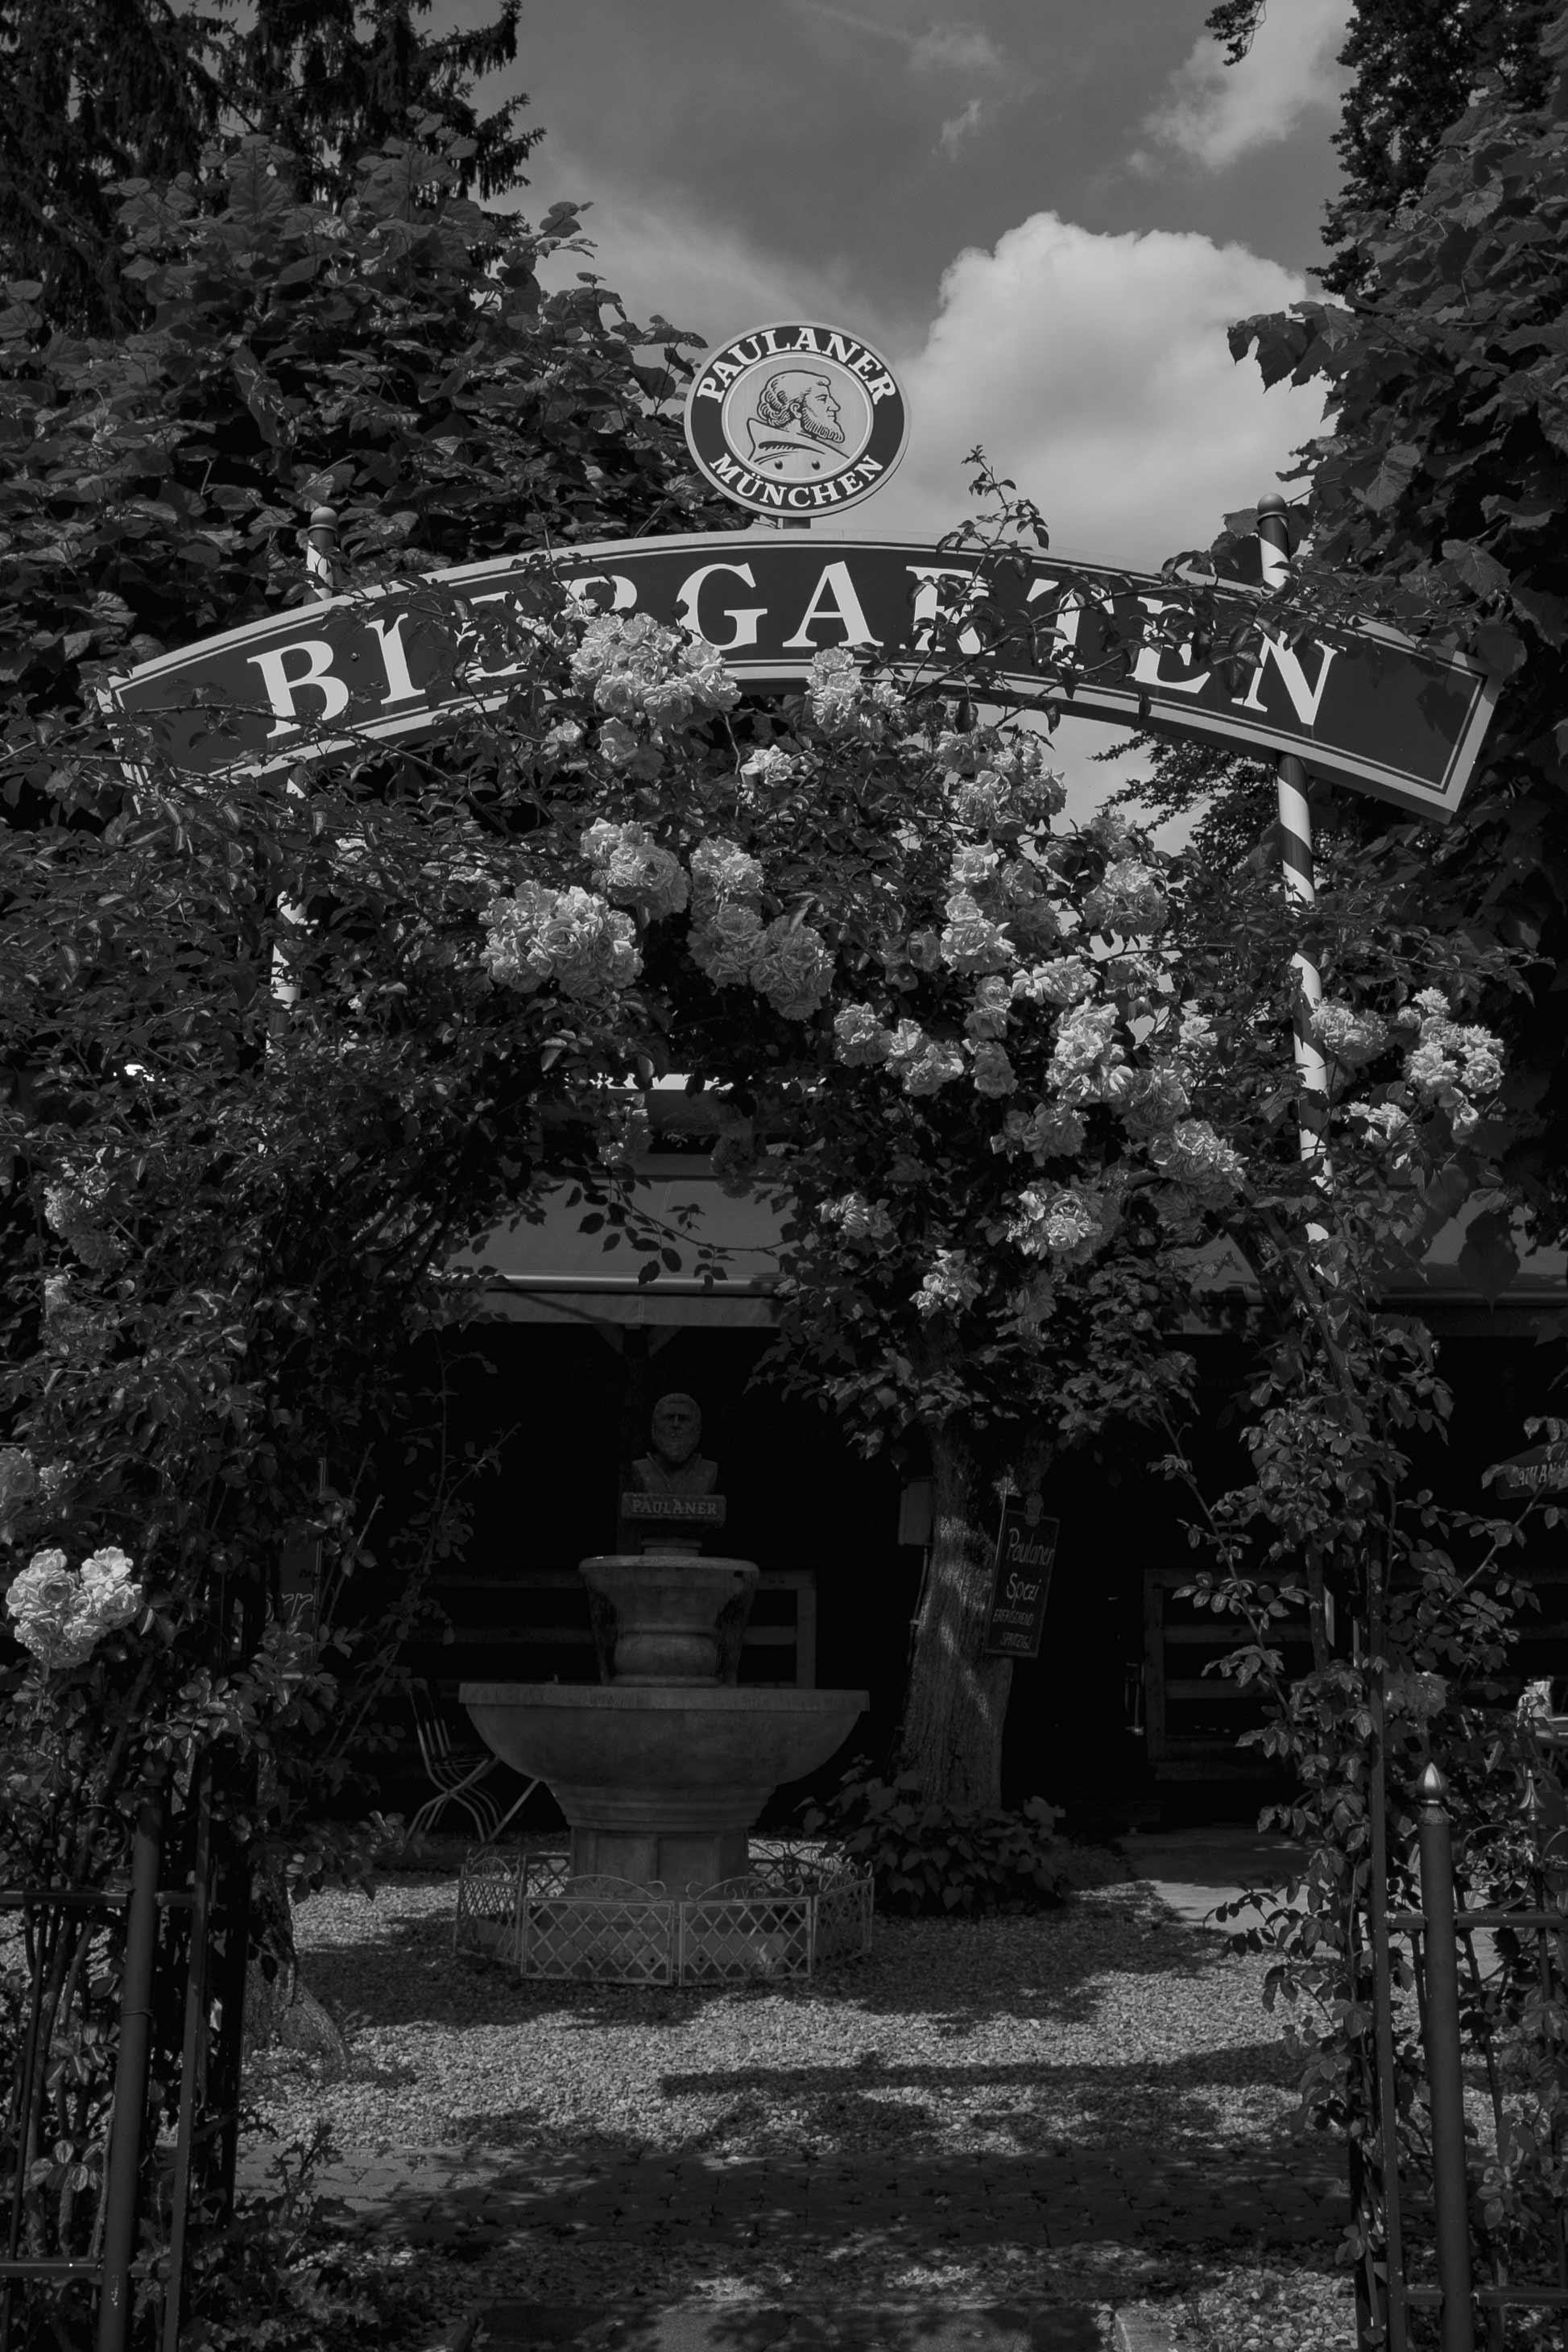 Biergarten Eingang